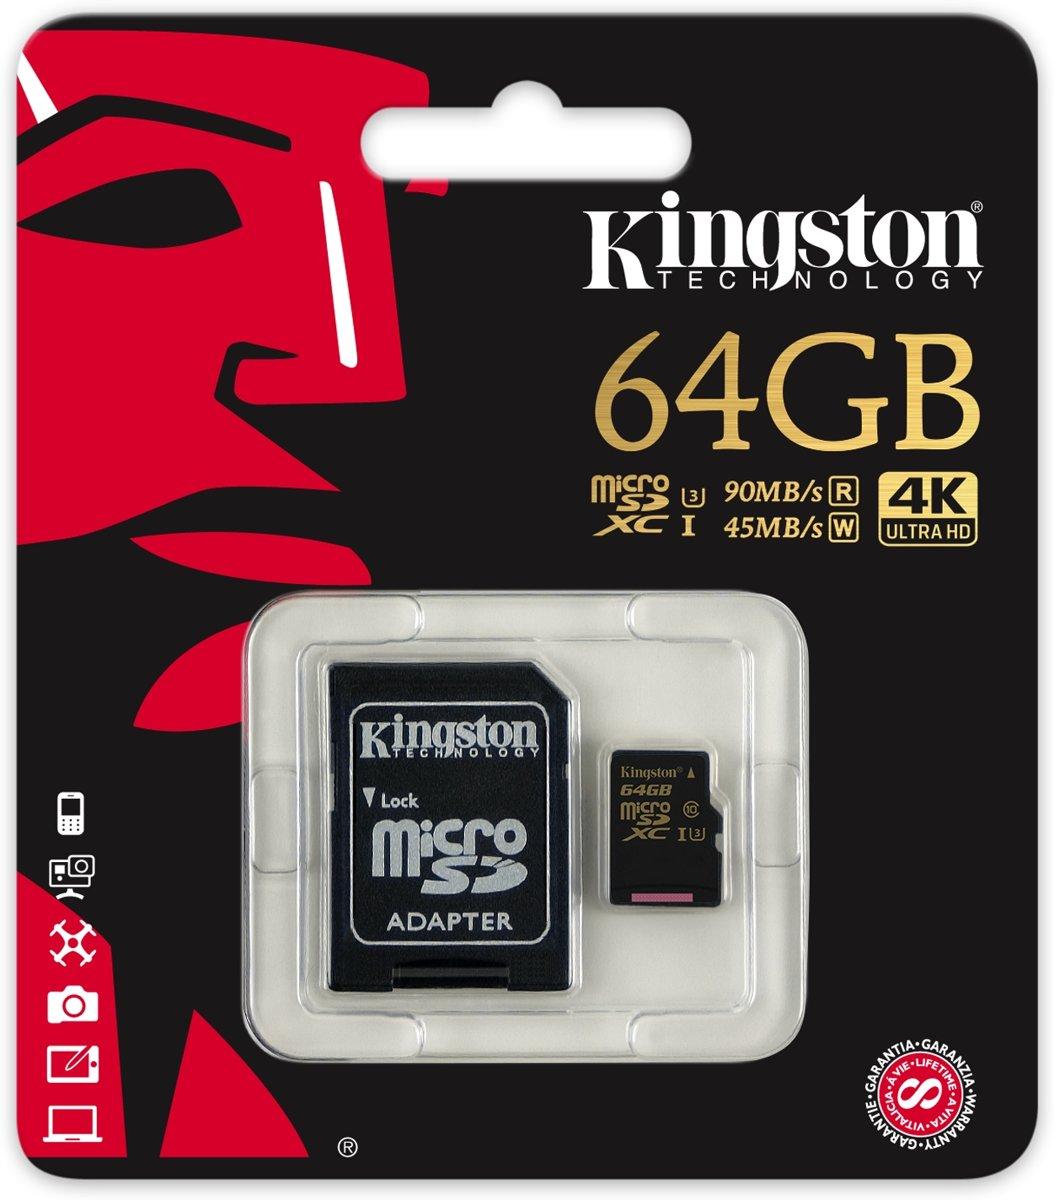 95m Kingston 64gb Gold Microsd Uhs Gotteamdesigns Sdhc Sandisk Cl10 Speed 80mb S Bolcom Technology I Class 3 U3